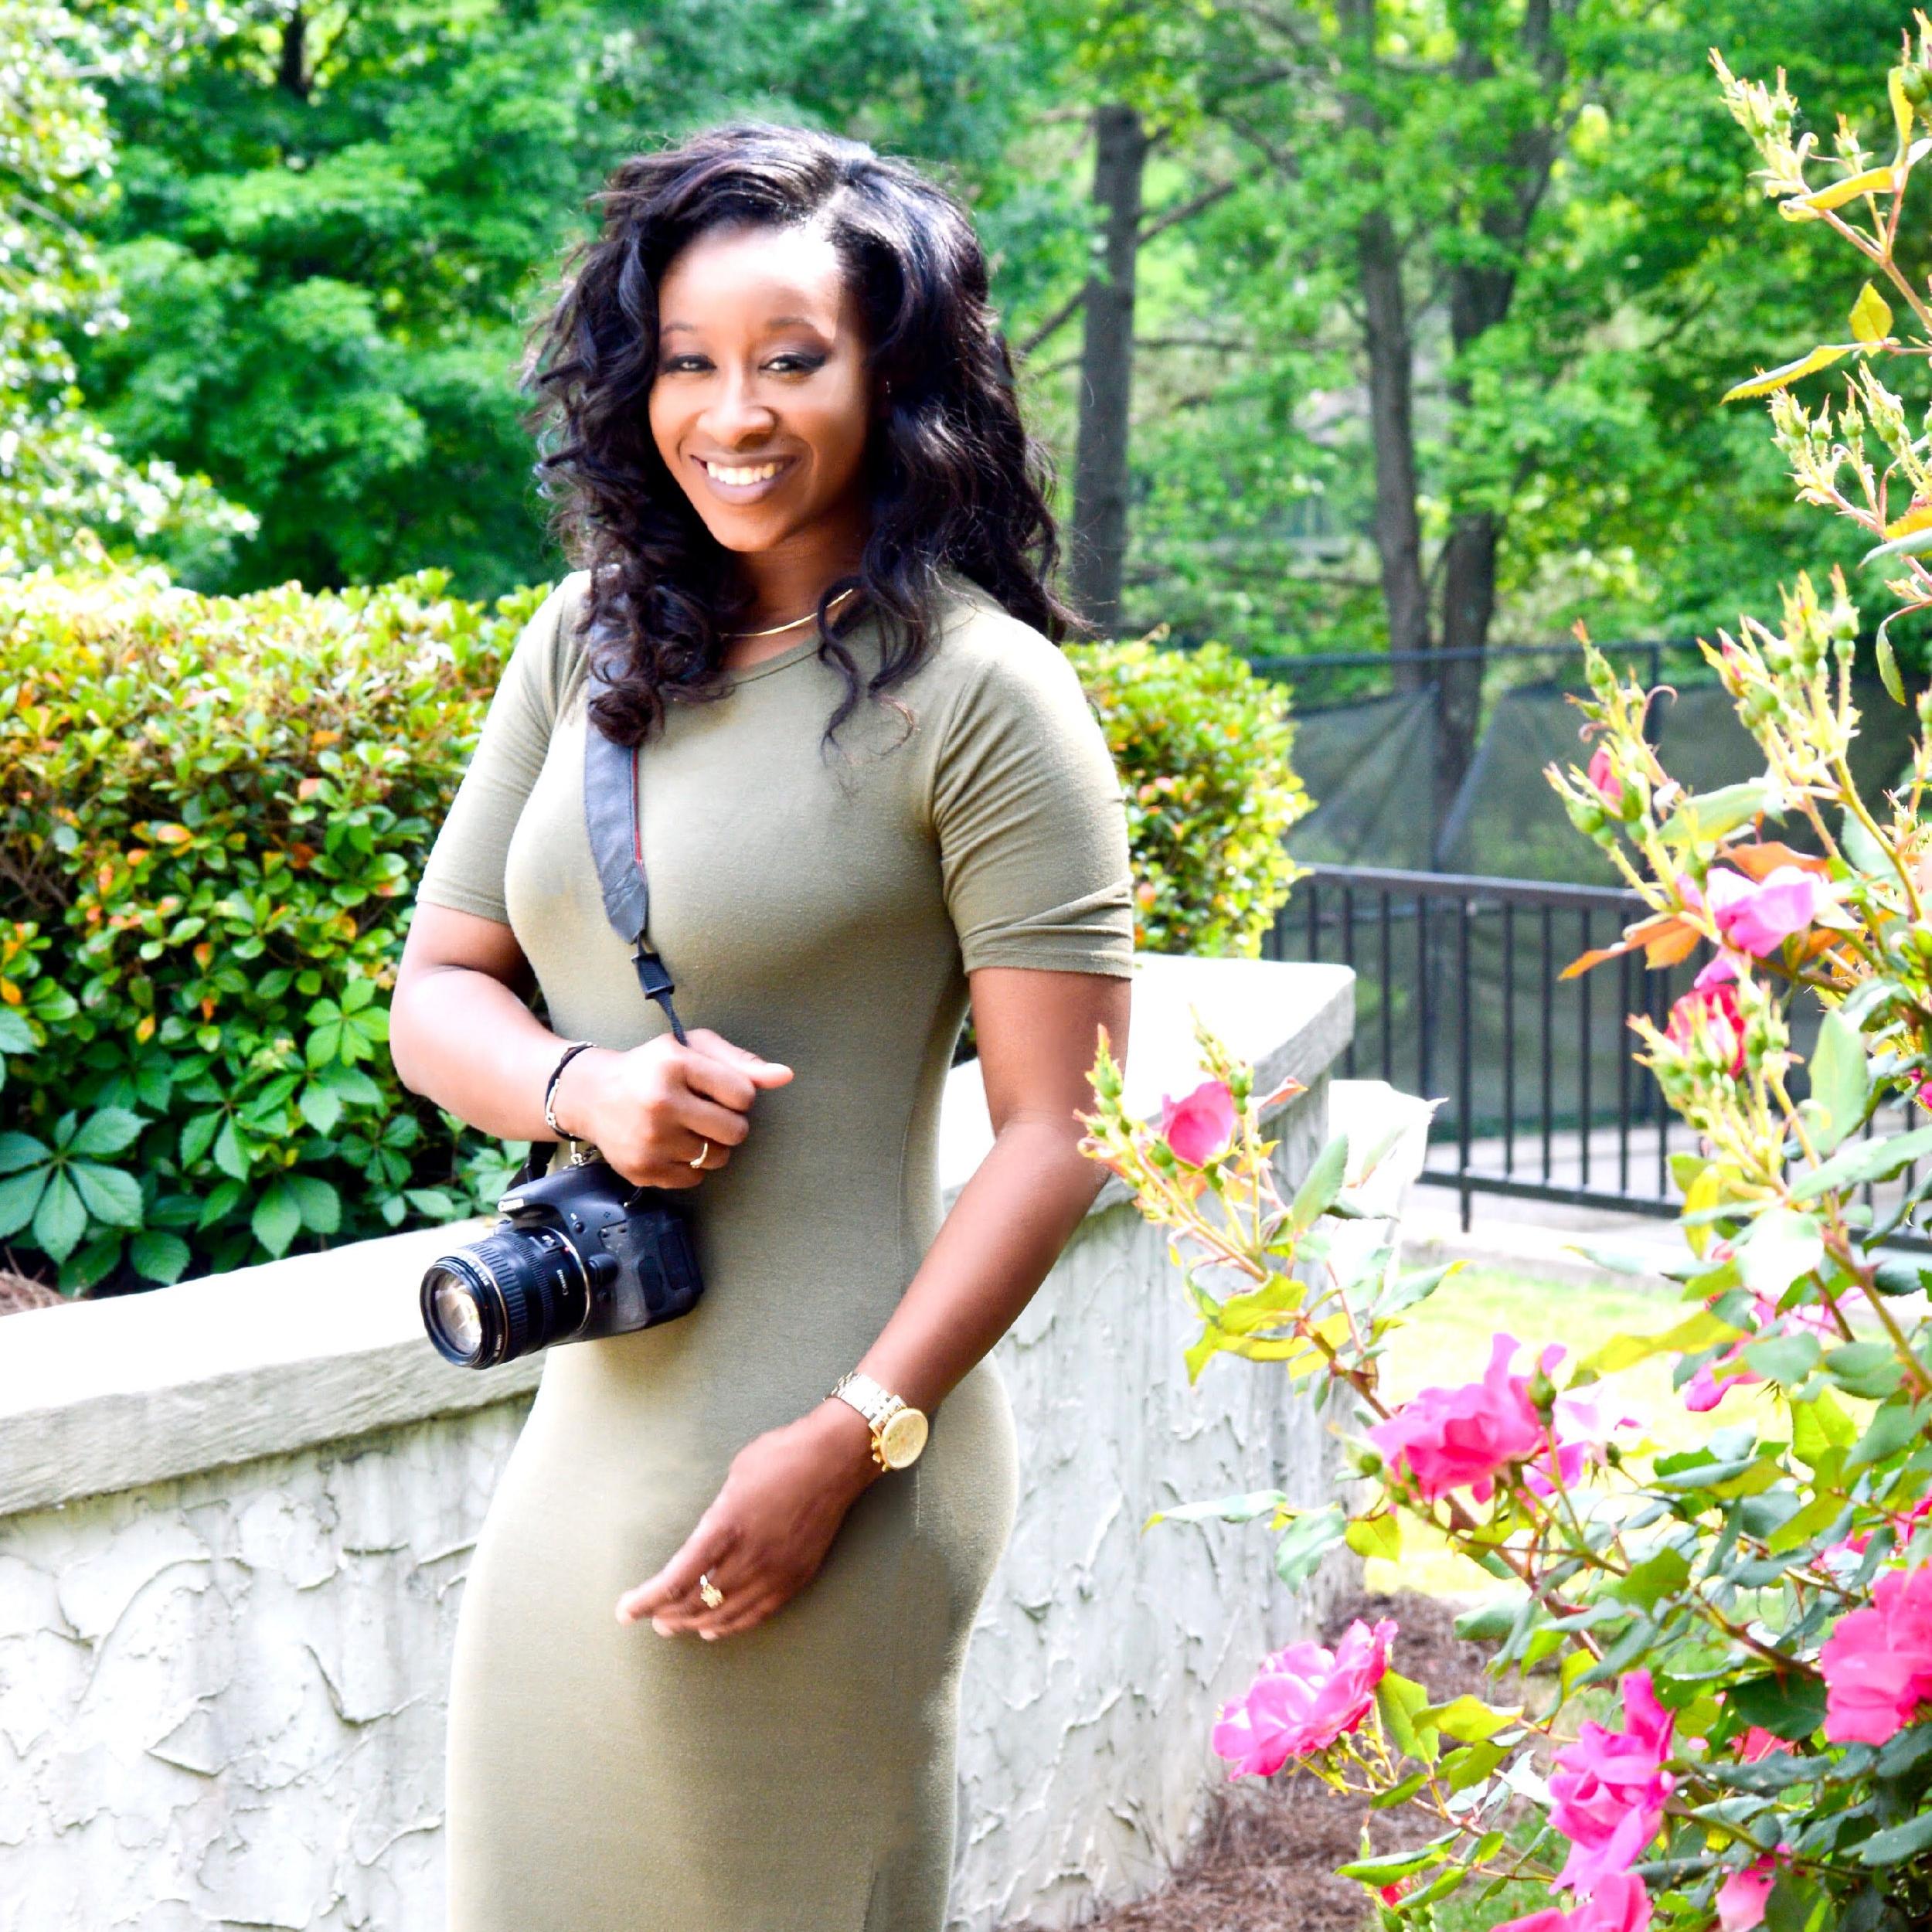 Meet Yasmin, the photographer behind  @YasminWattsPhotography   Location: Decatur, Georgia